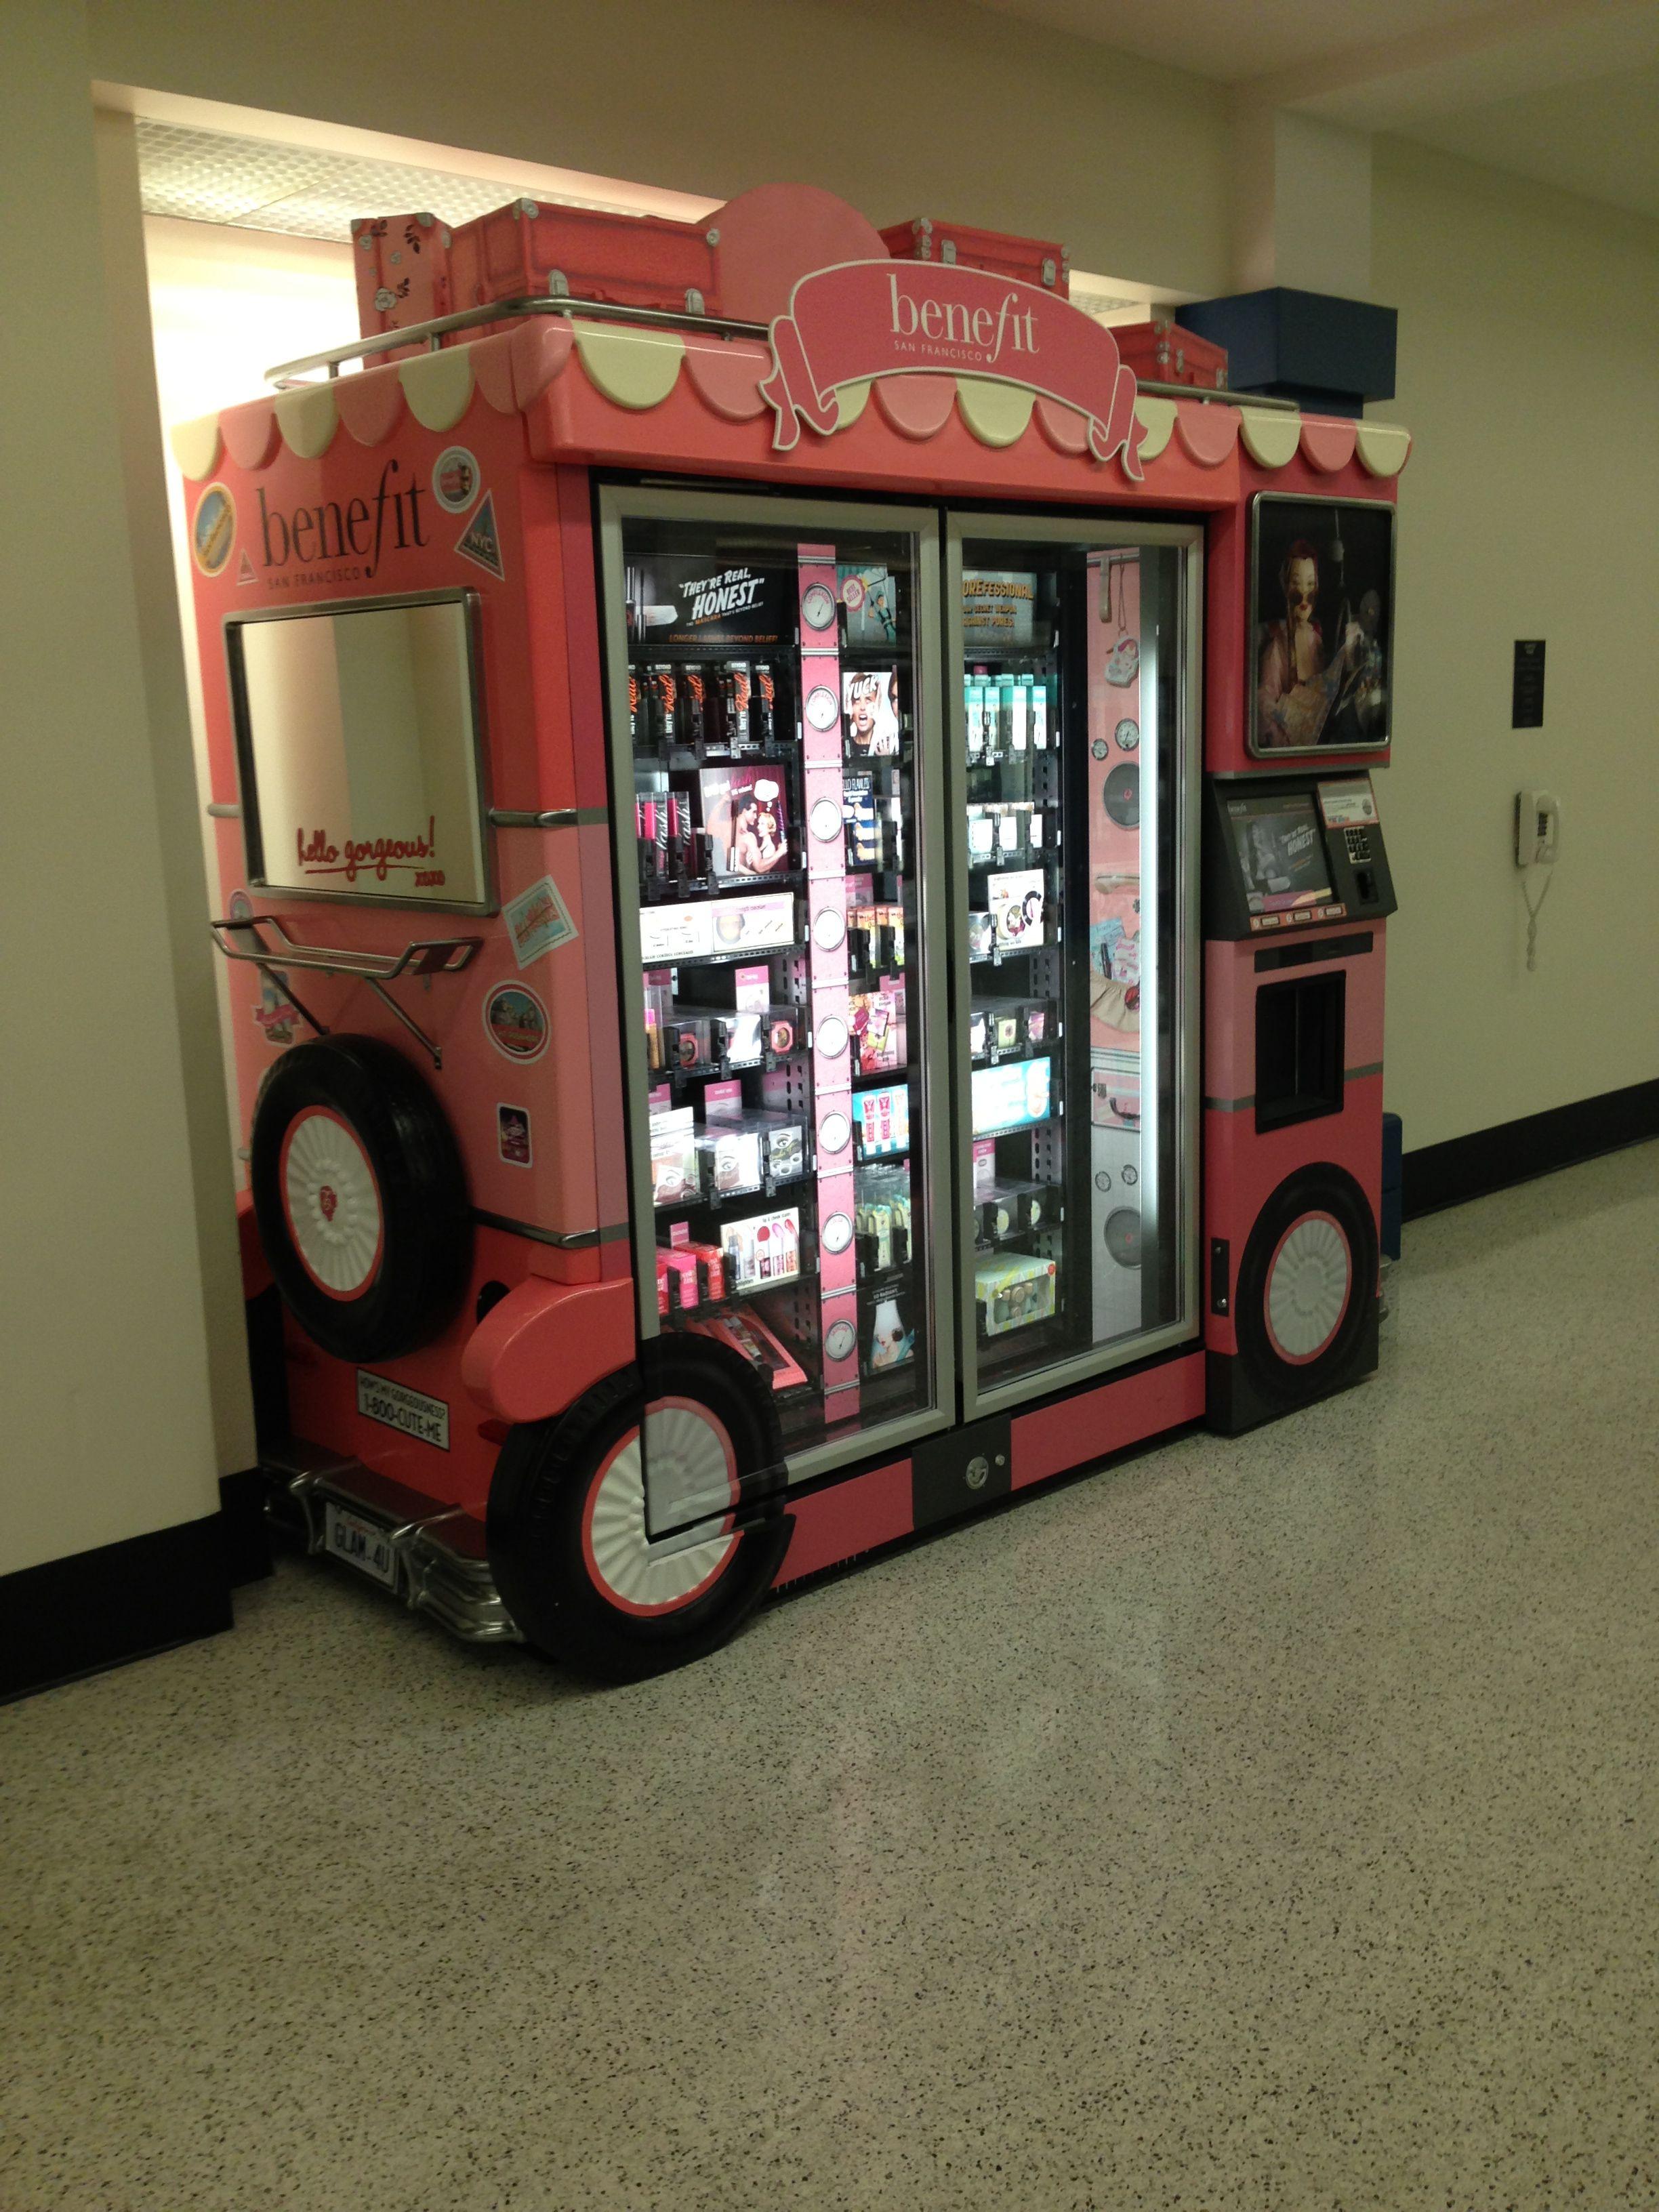 Benefit vending machine Cleveland airport. Last minute